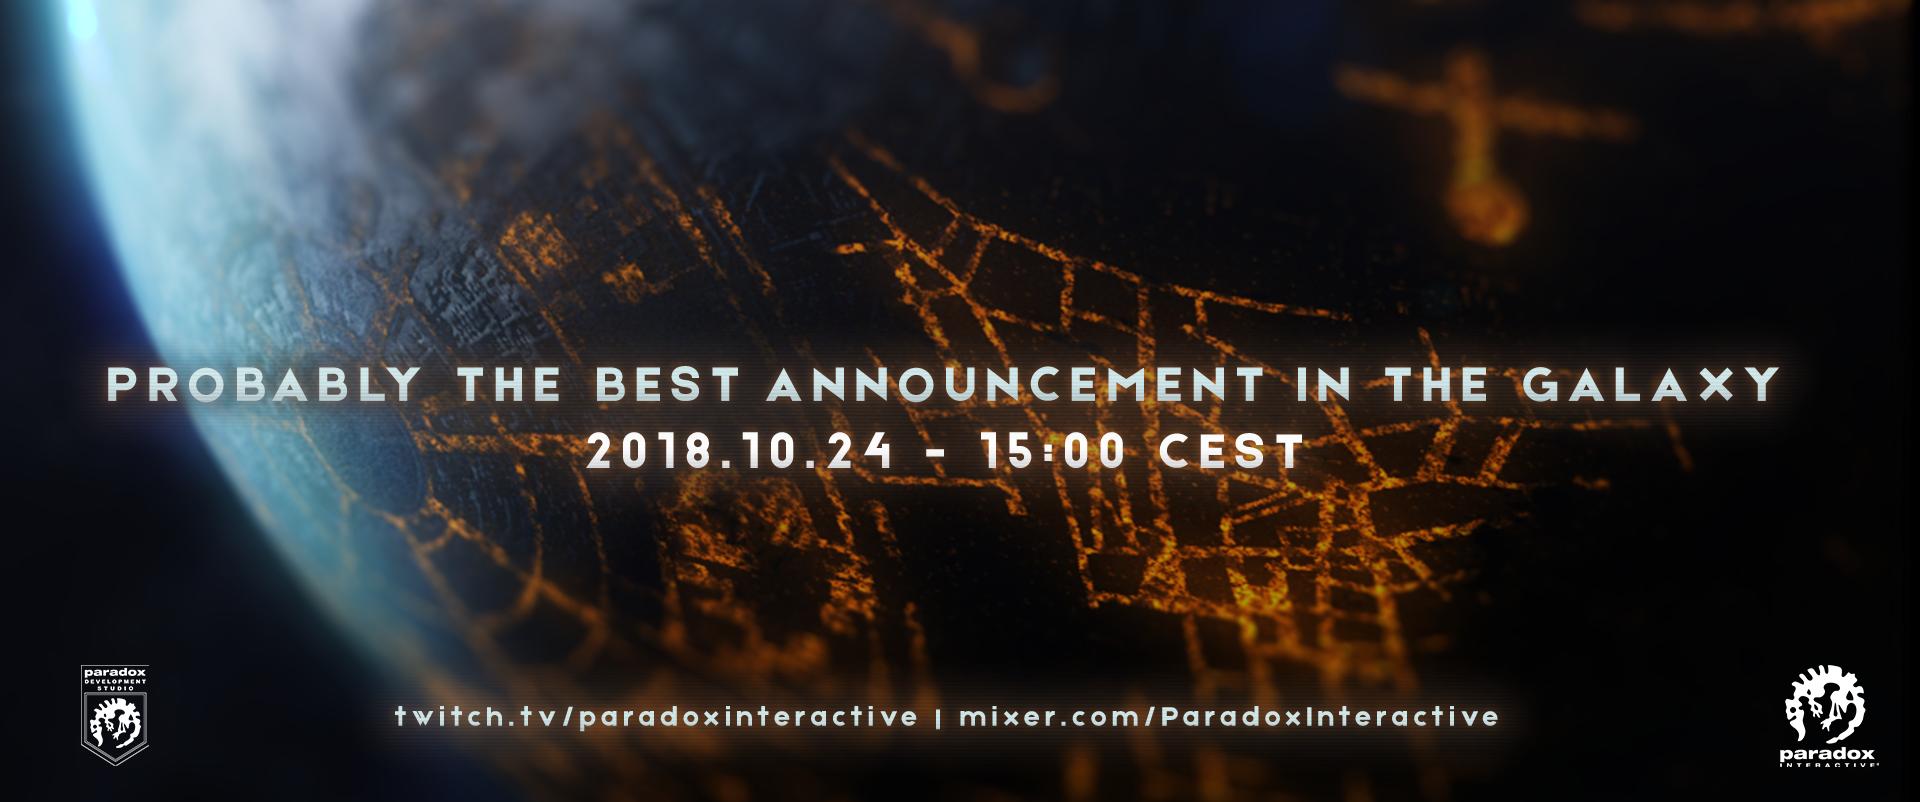 forumcontent.paradoxplaza.com/public/paradox/banners/announcement%20teaser.png